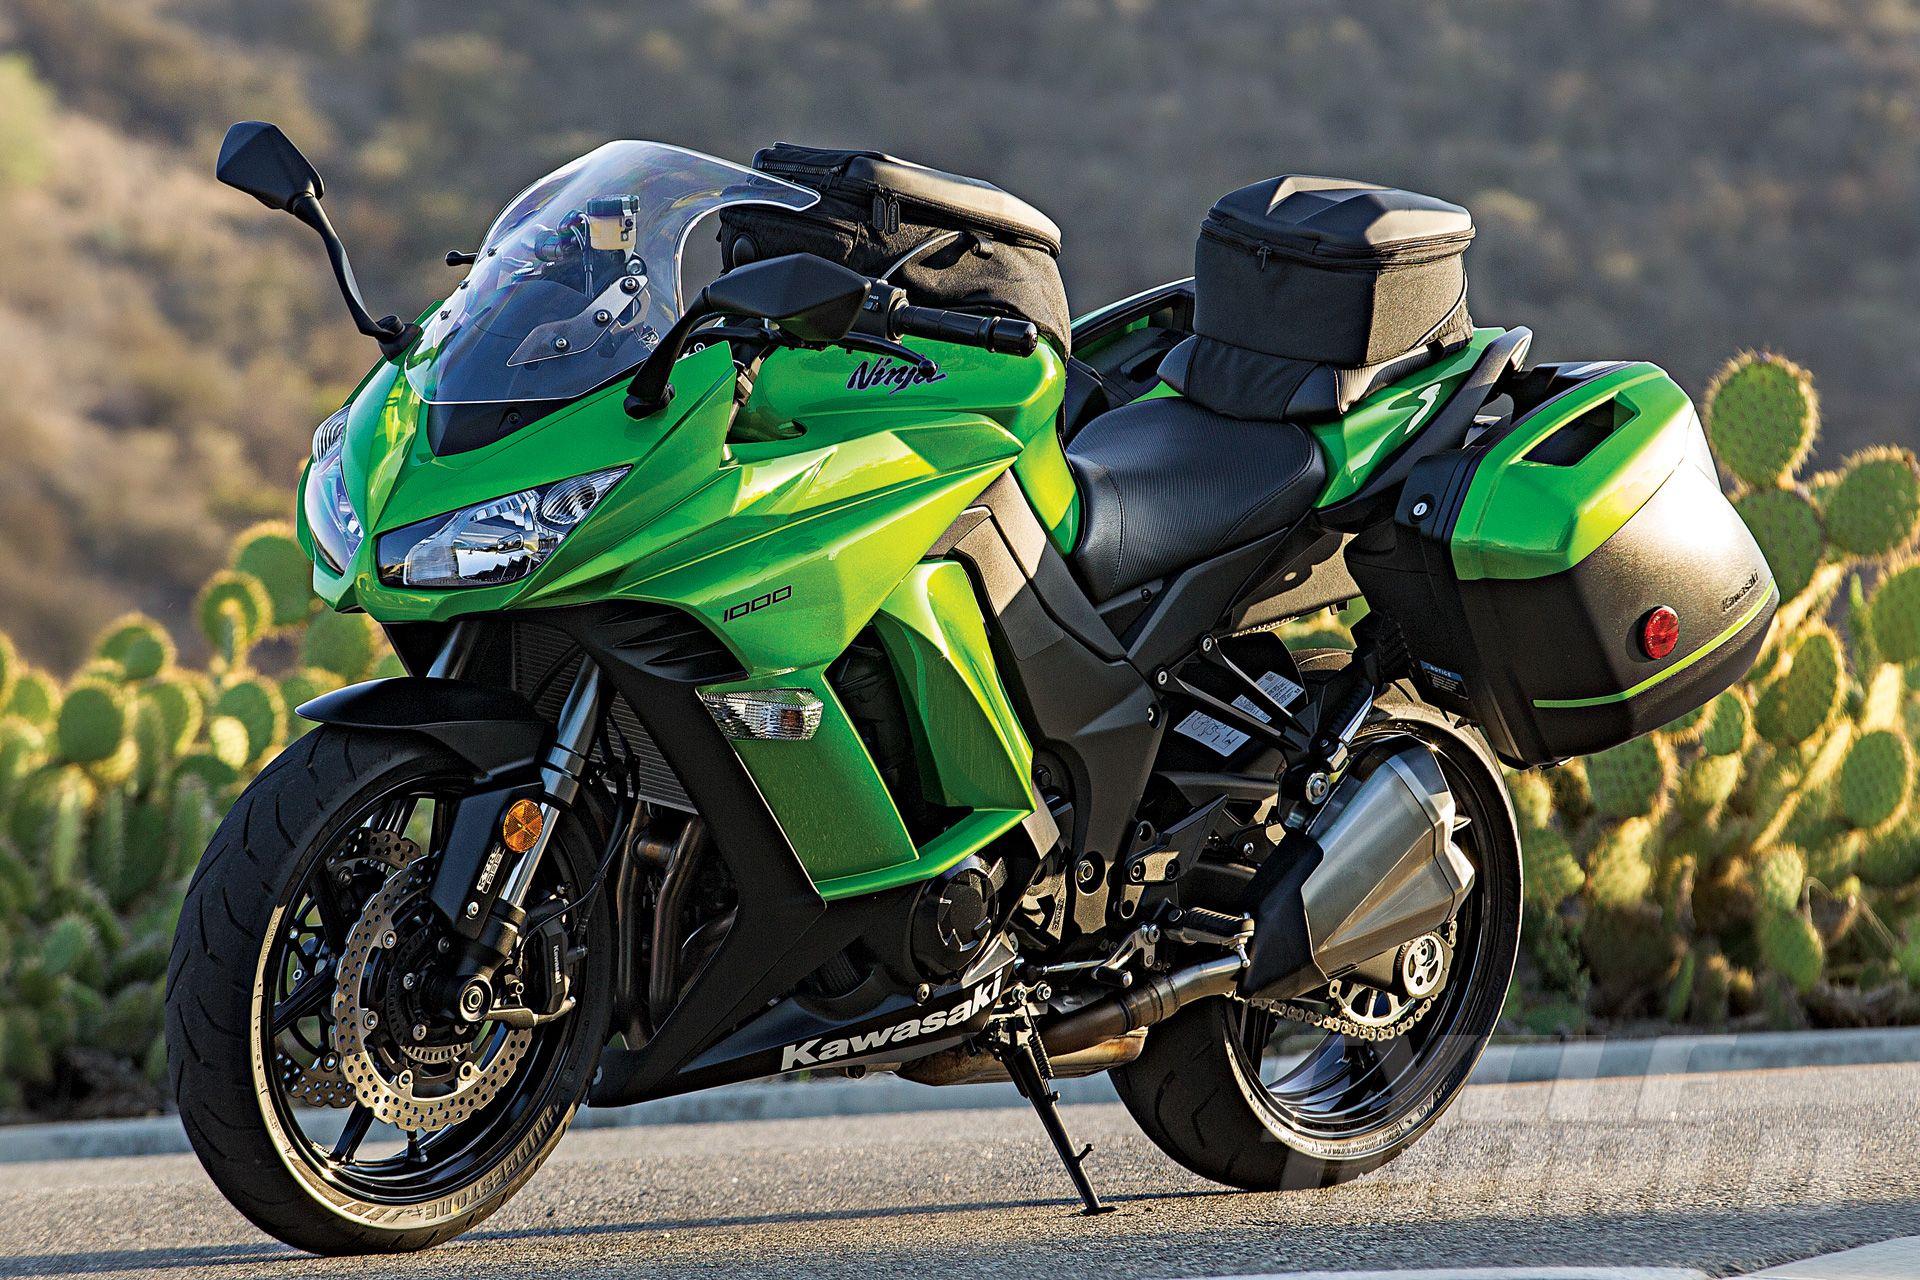 Kawasaki Ninja 1000 Abs Long Term Test Intro Review Specifications